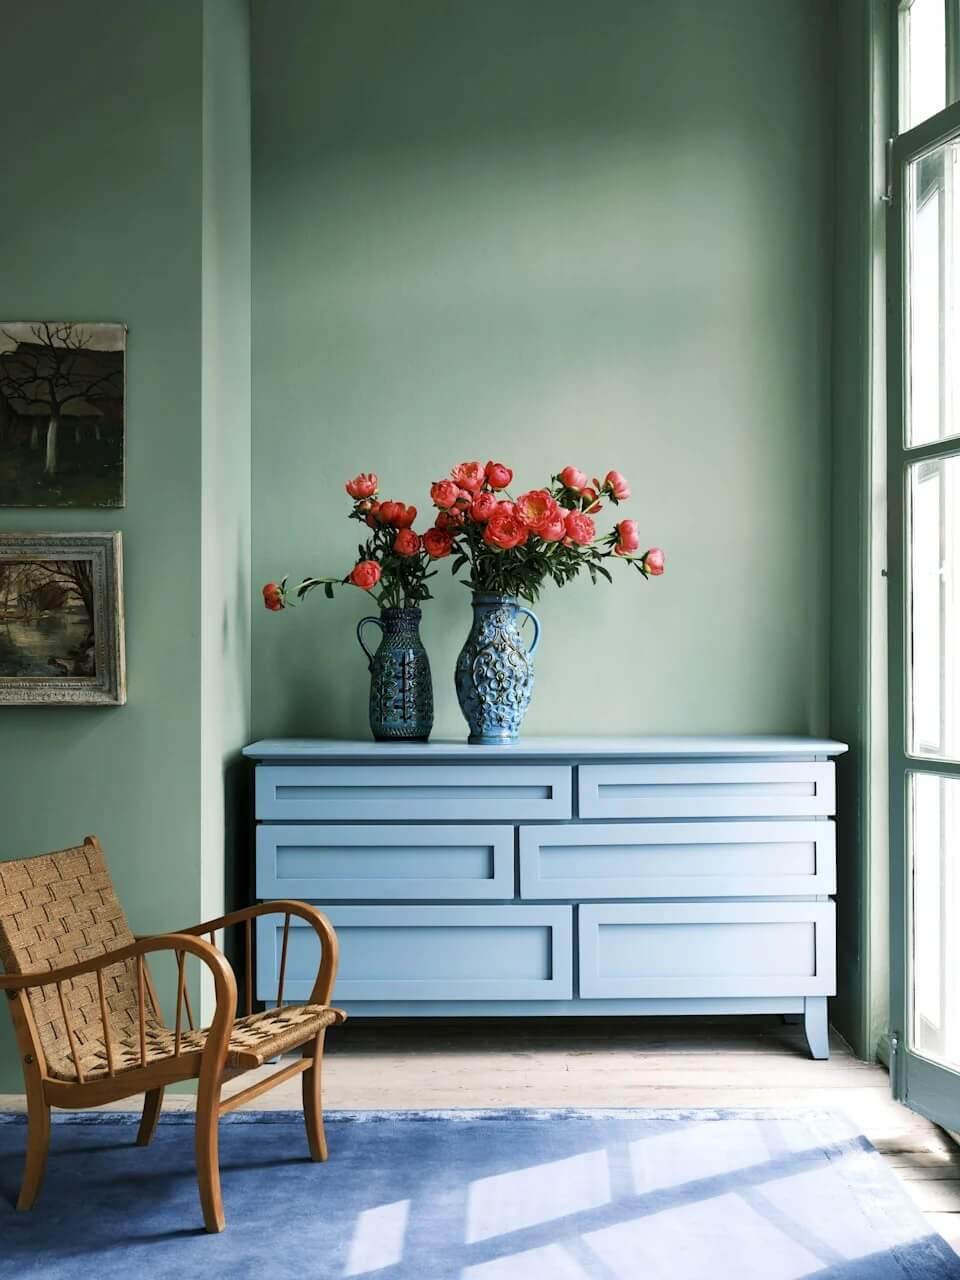 breakfast-room-green-farrow-ball-colour-trends-2022-nordroom